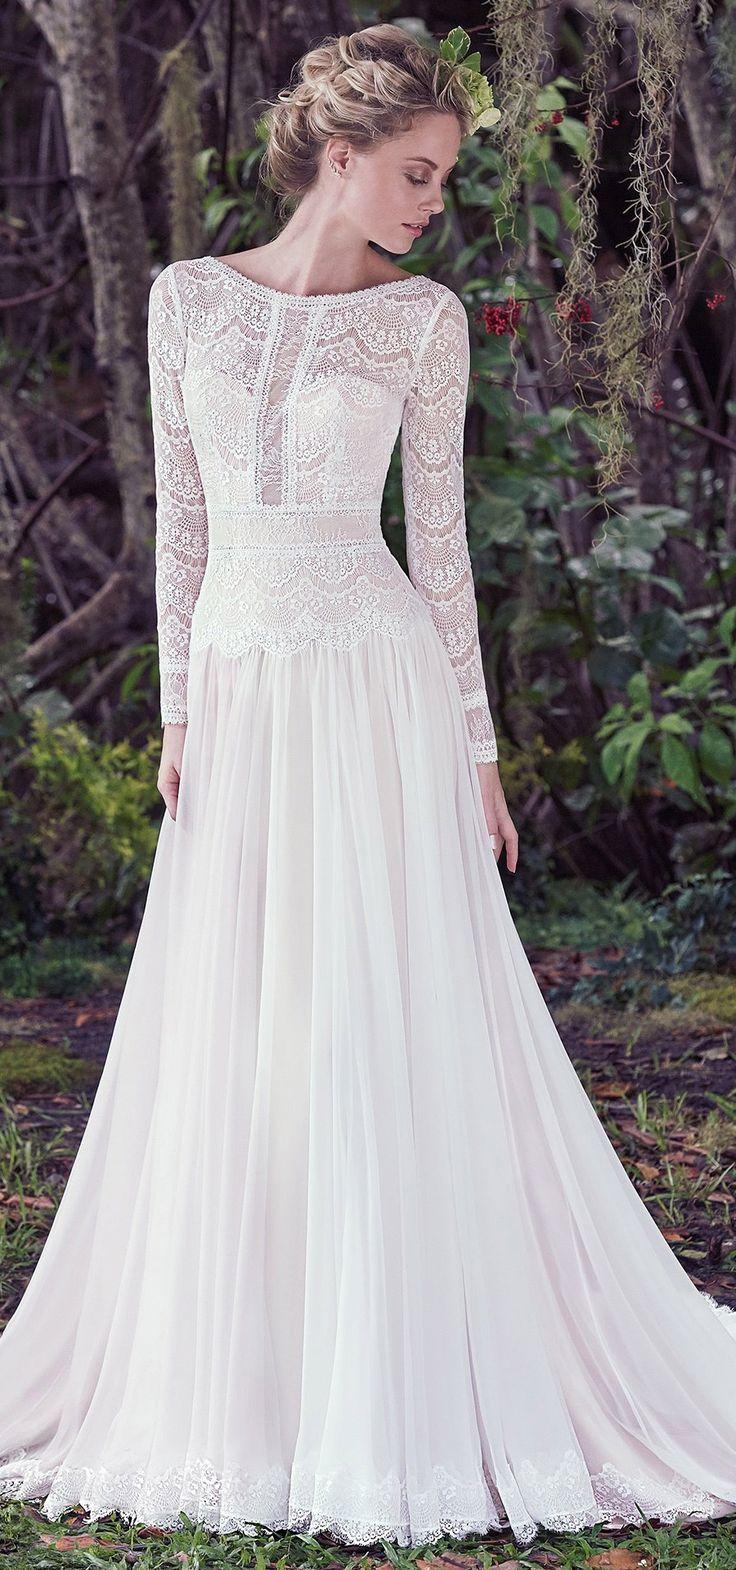 Antique cream wedding dress   best Wedding dresses images on Pinterest  Gown wedding Wedding